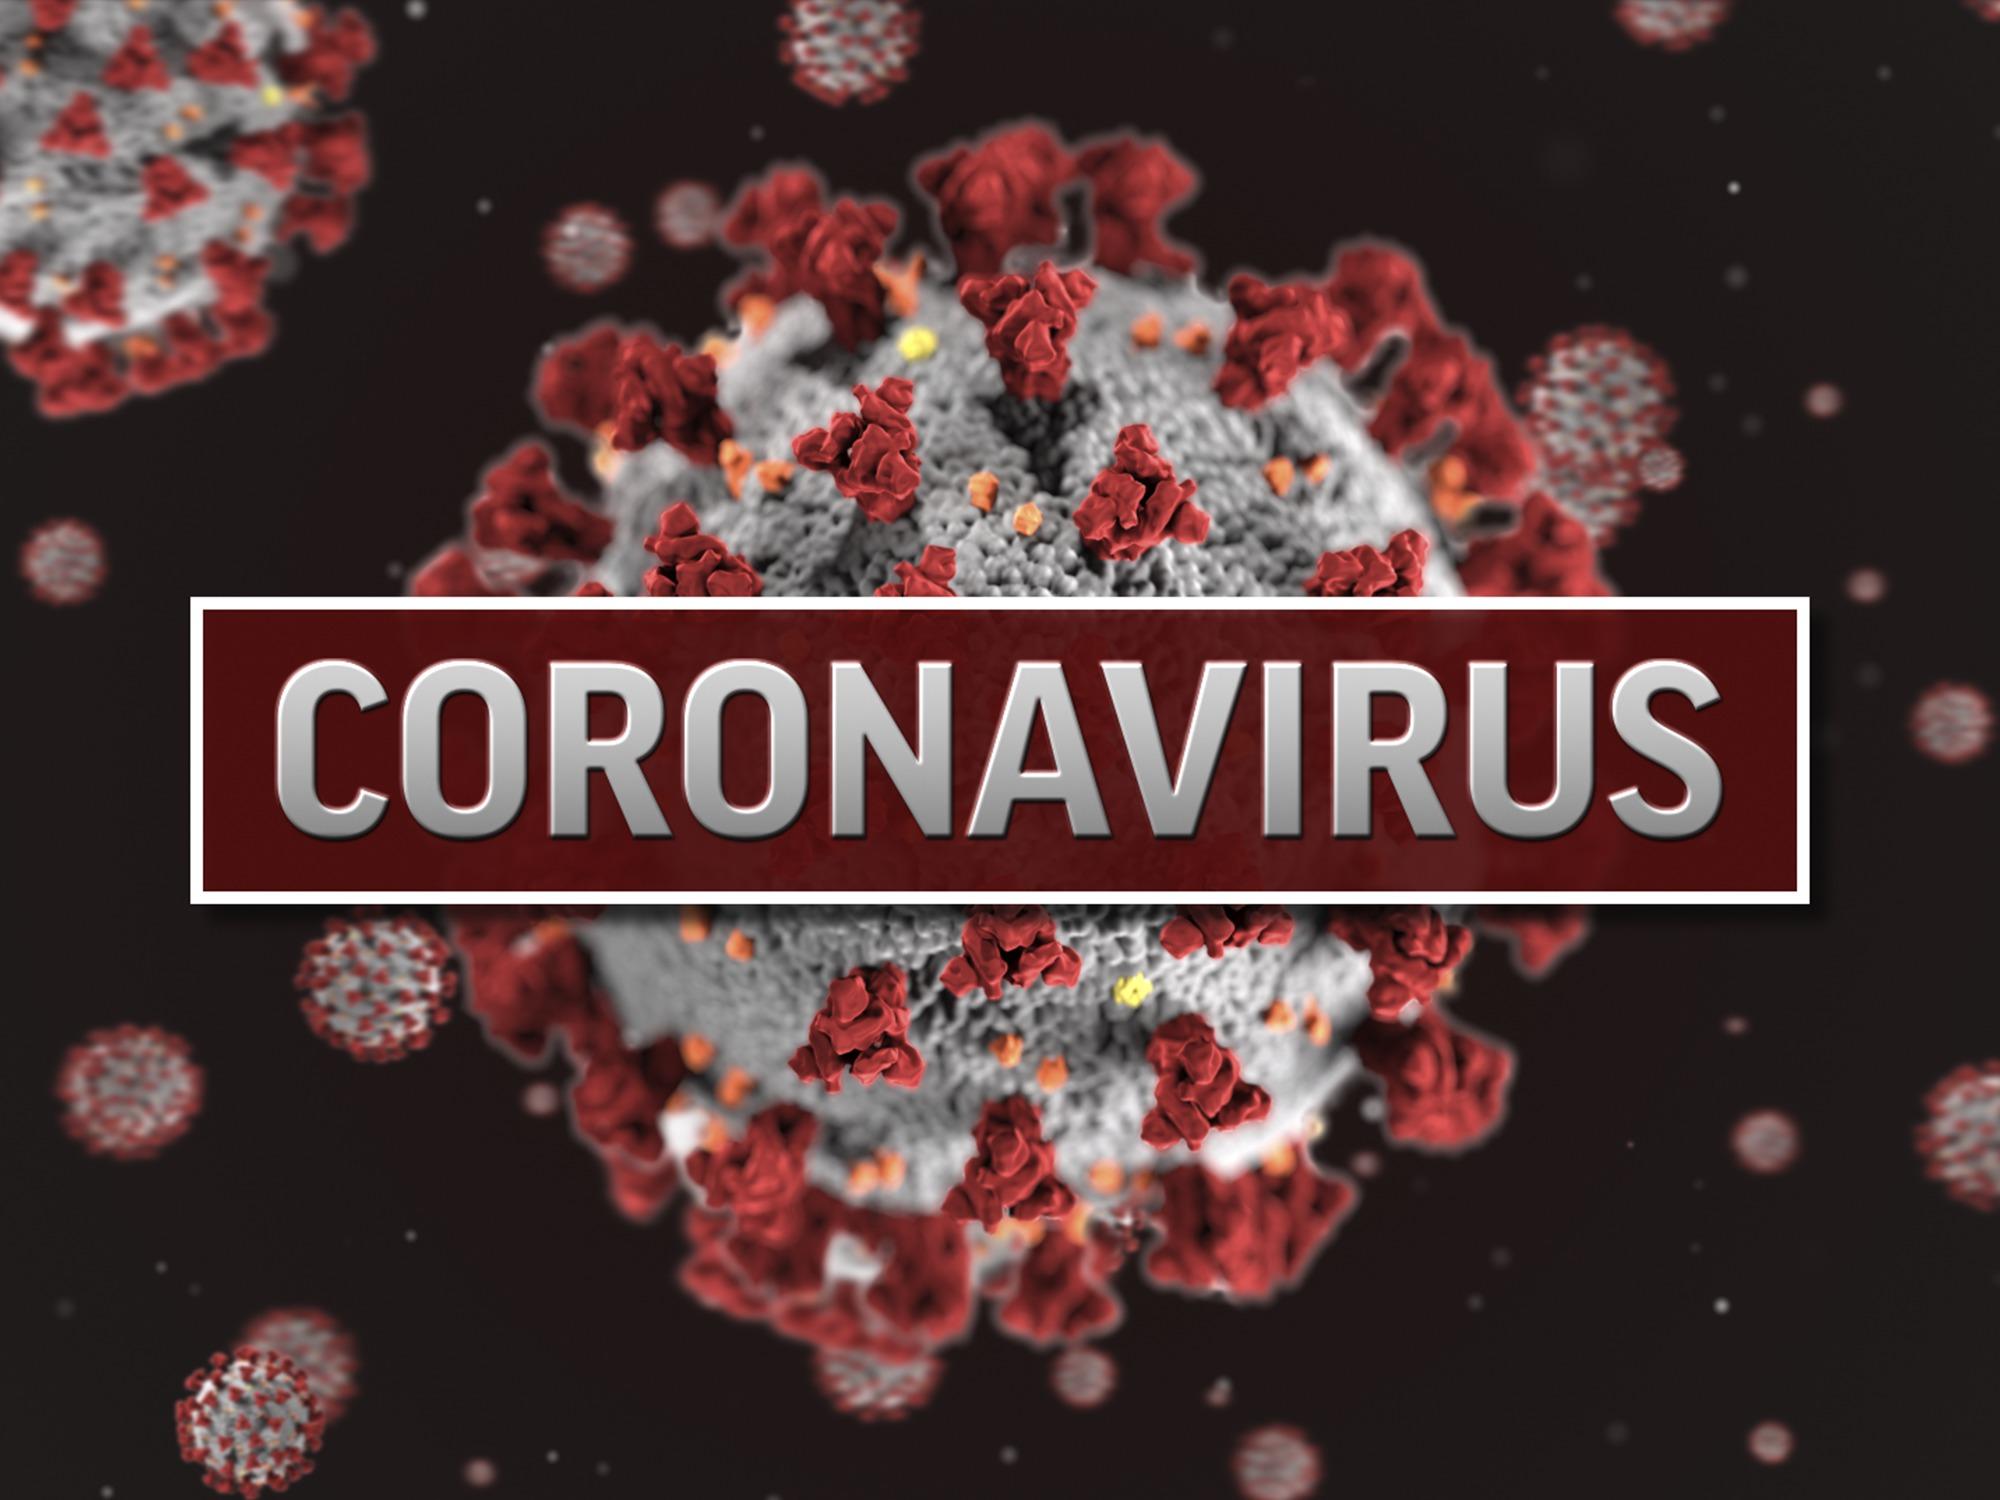 Coronavirus Sunday Updates: Confirmed cases rise to 219 in Virginia, 255 in North Carolina